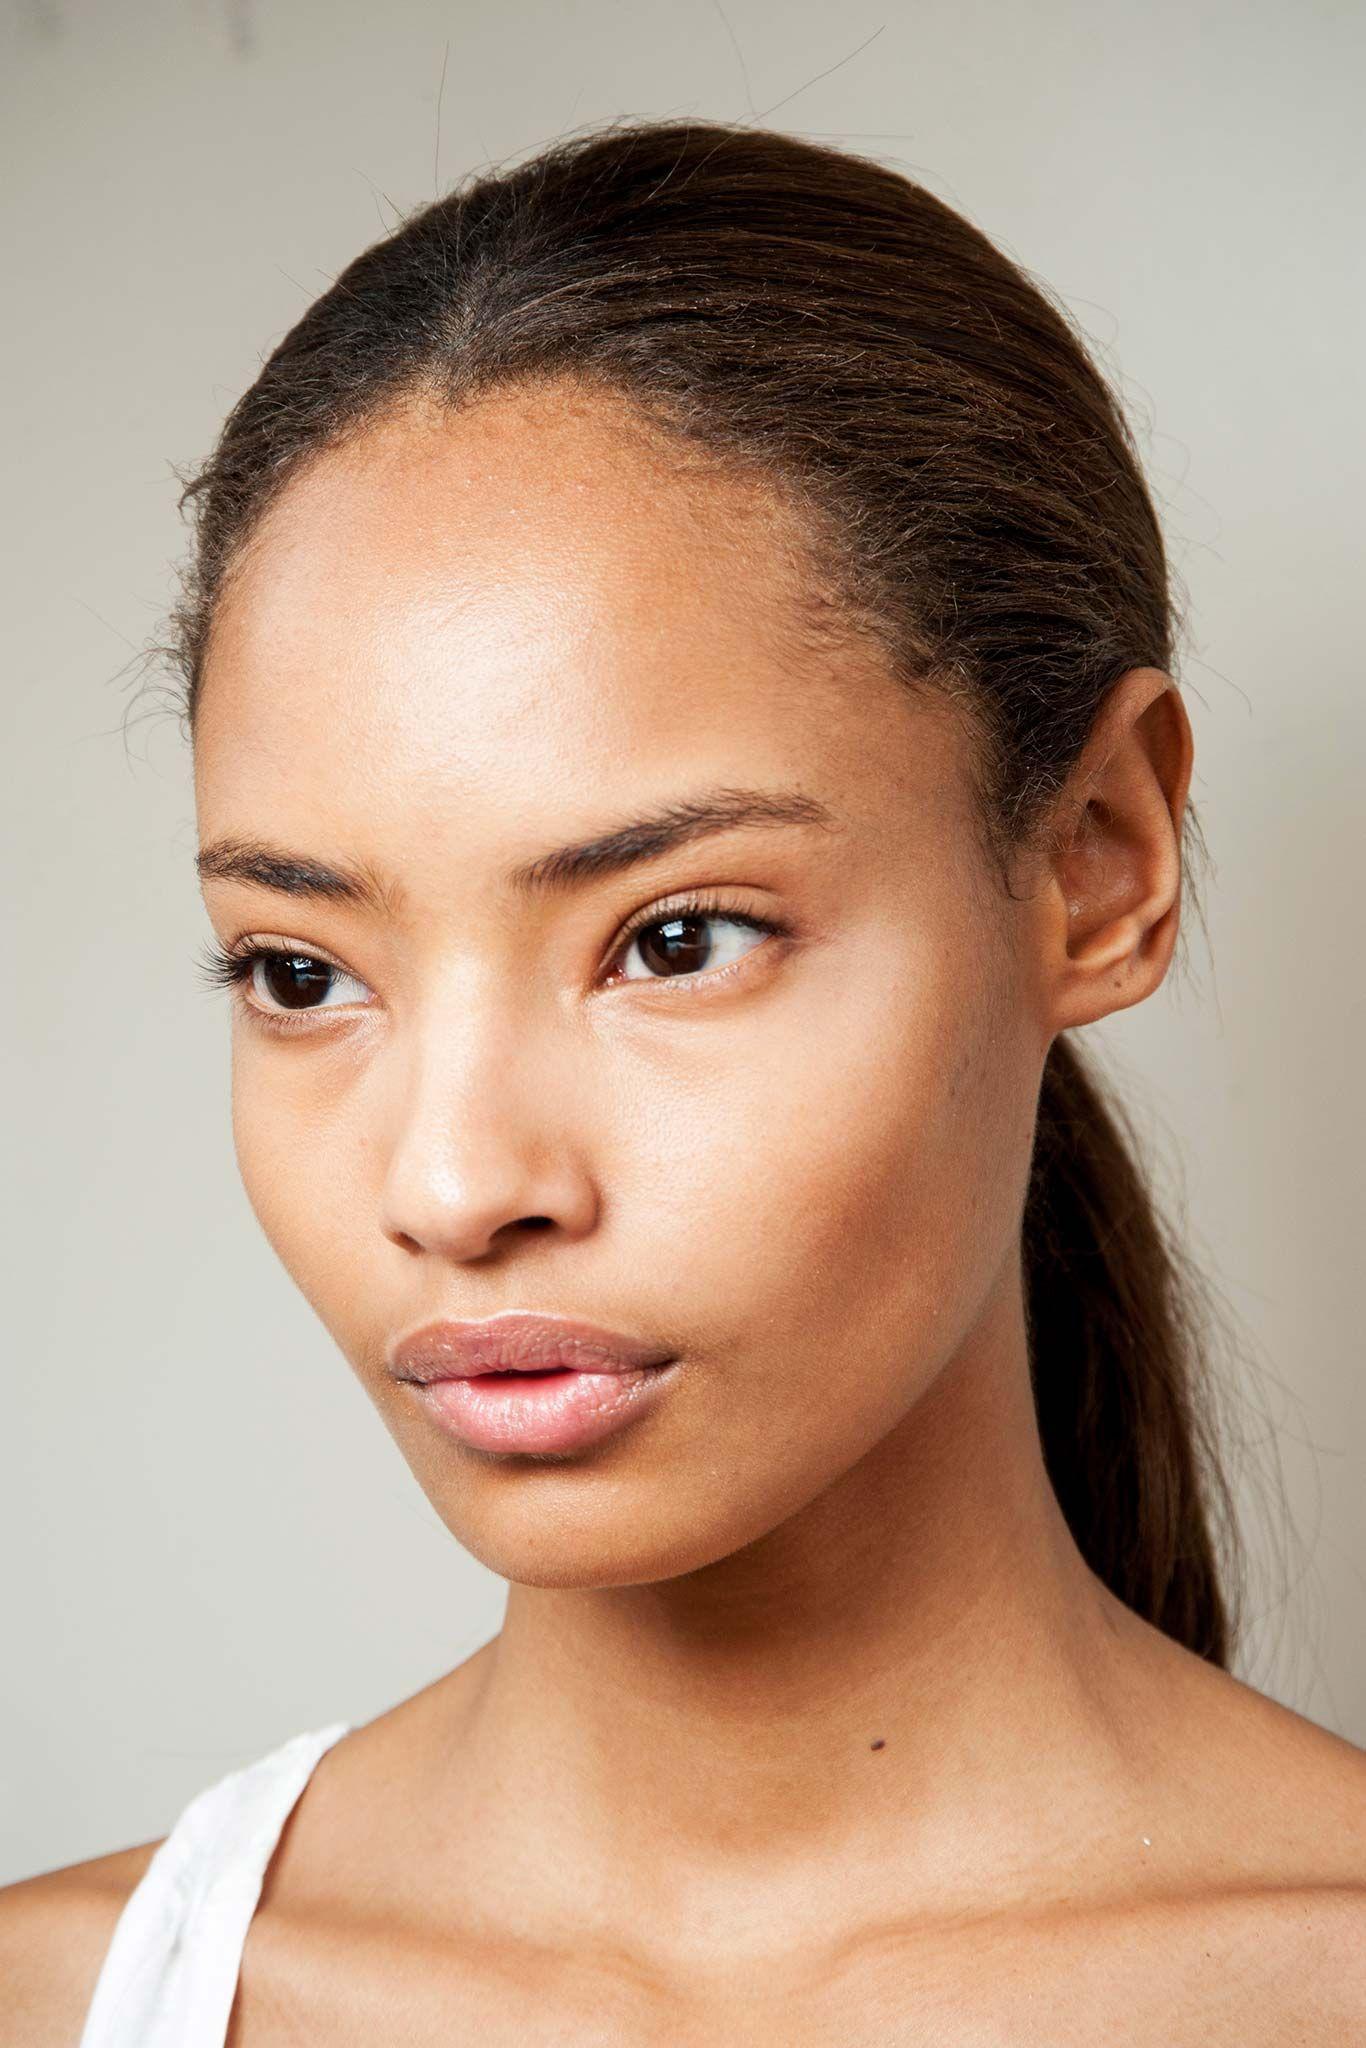 CAT SMITH — THE FUTURE MRS Fashion makeup, Top makeup